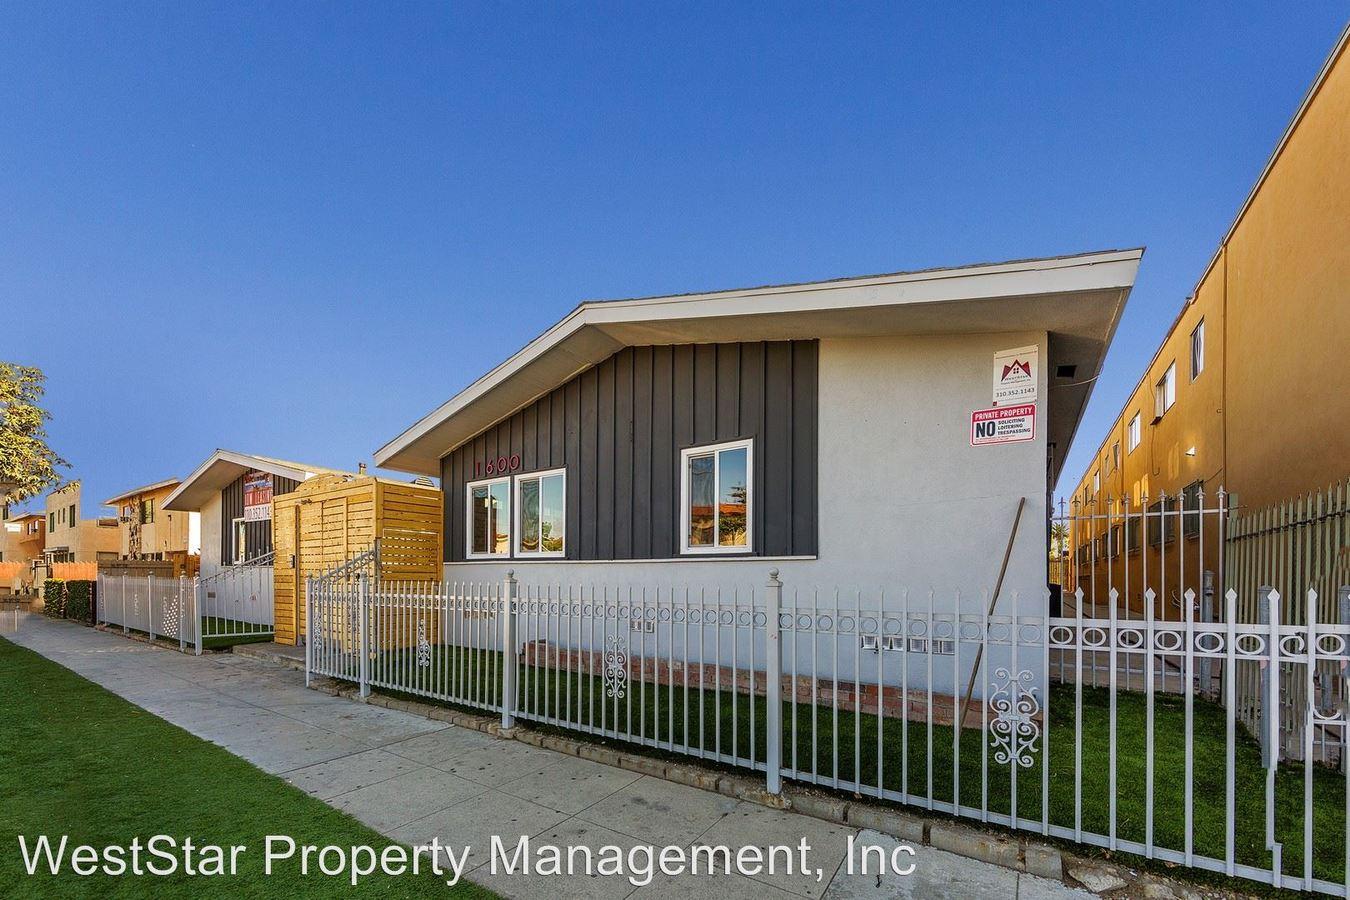 2 Bedrooms 1 Bathroom Apartment for rent at 1600- 1602 Cedar Avenue in Long Beach, CA